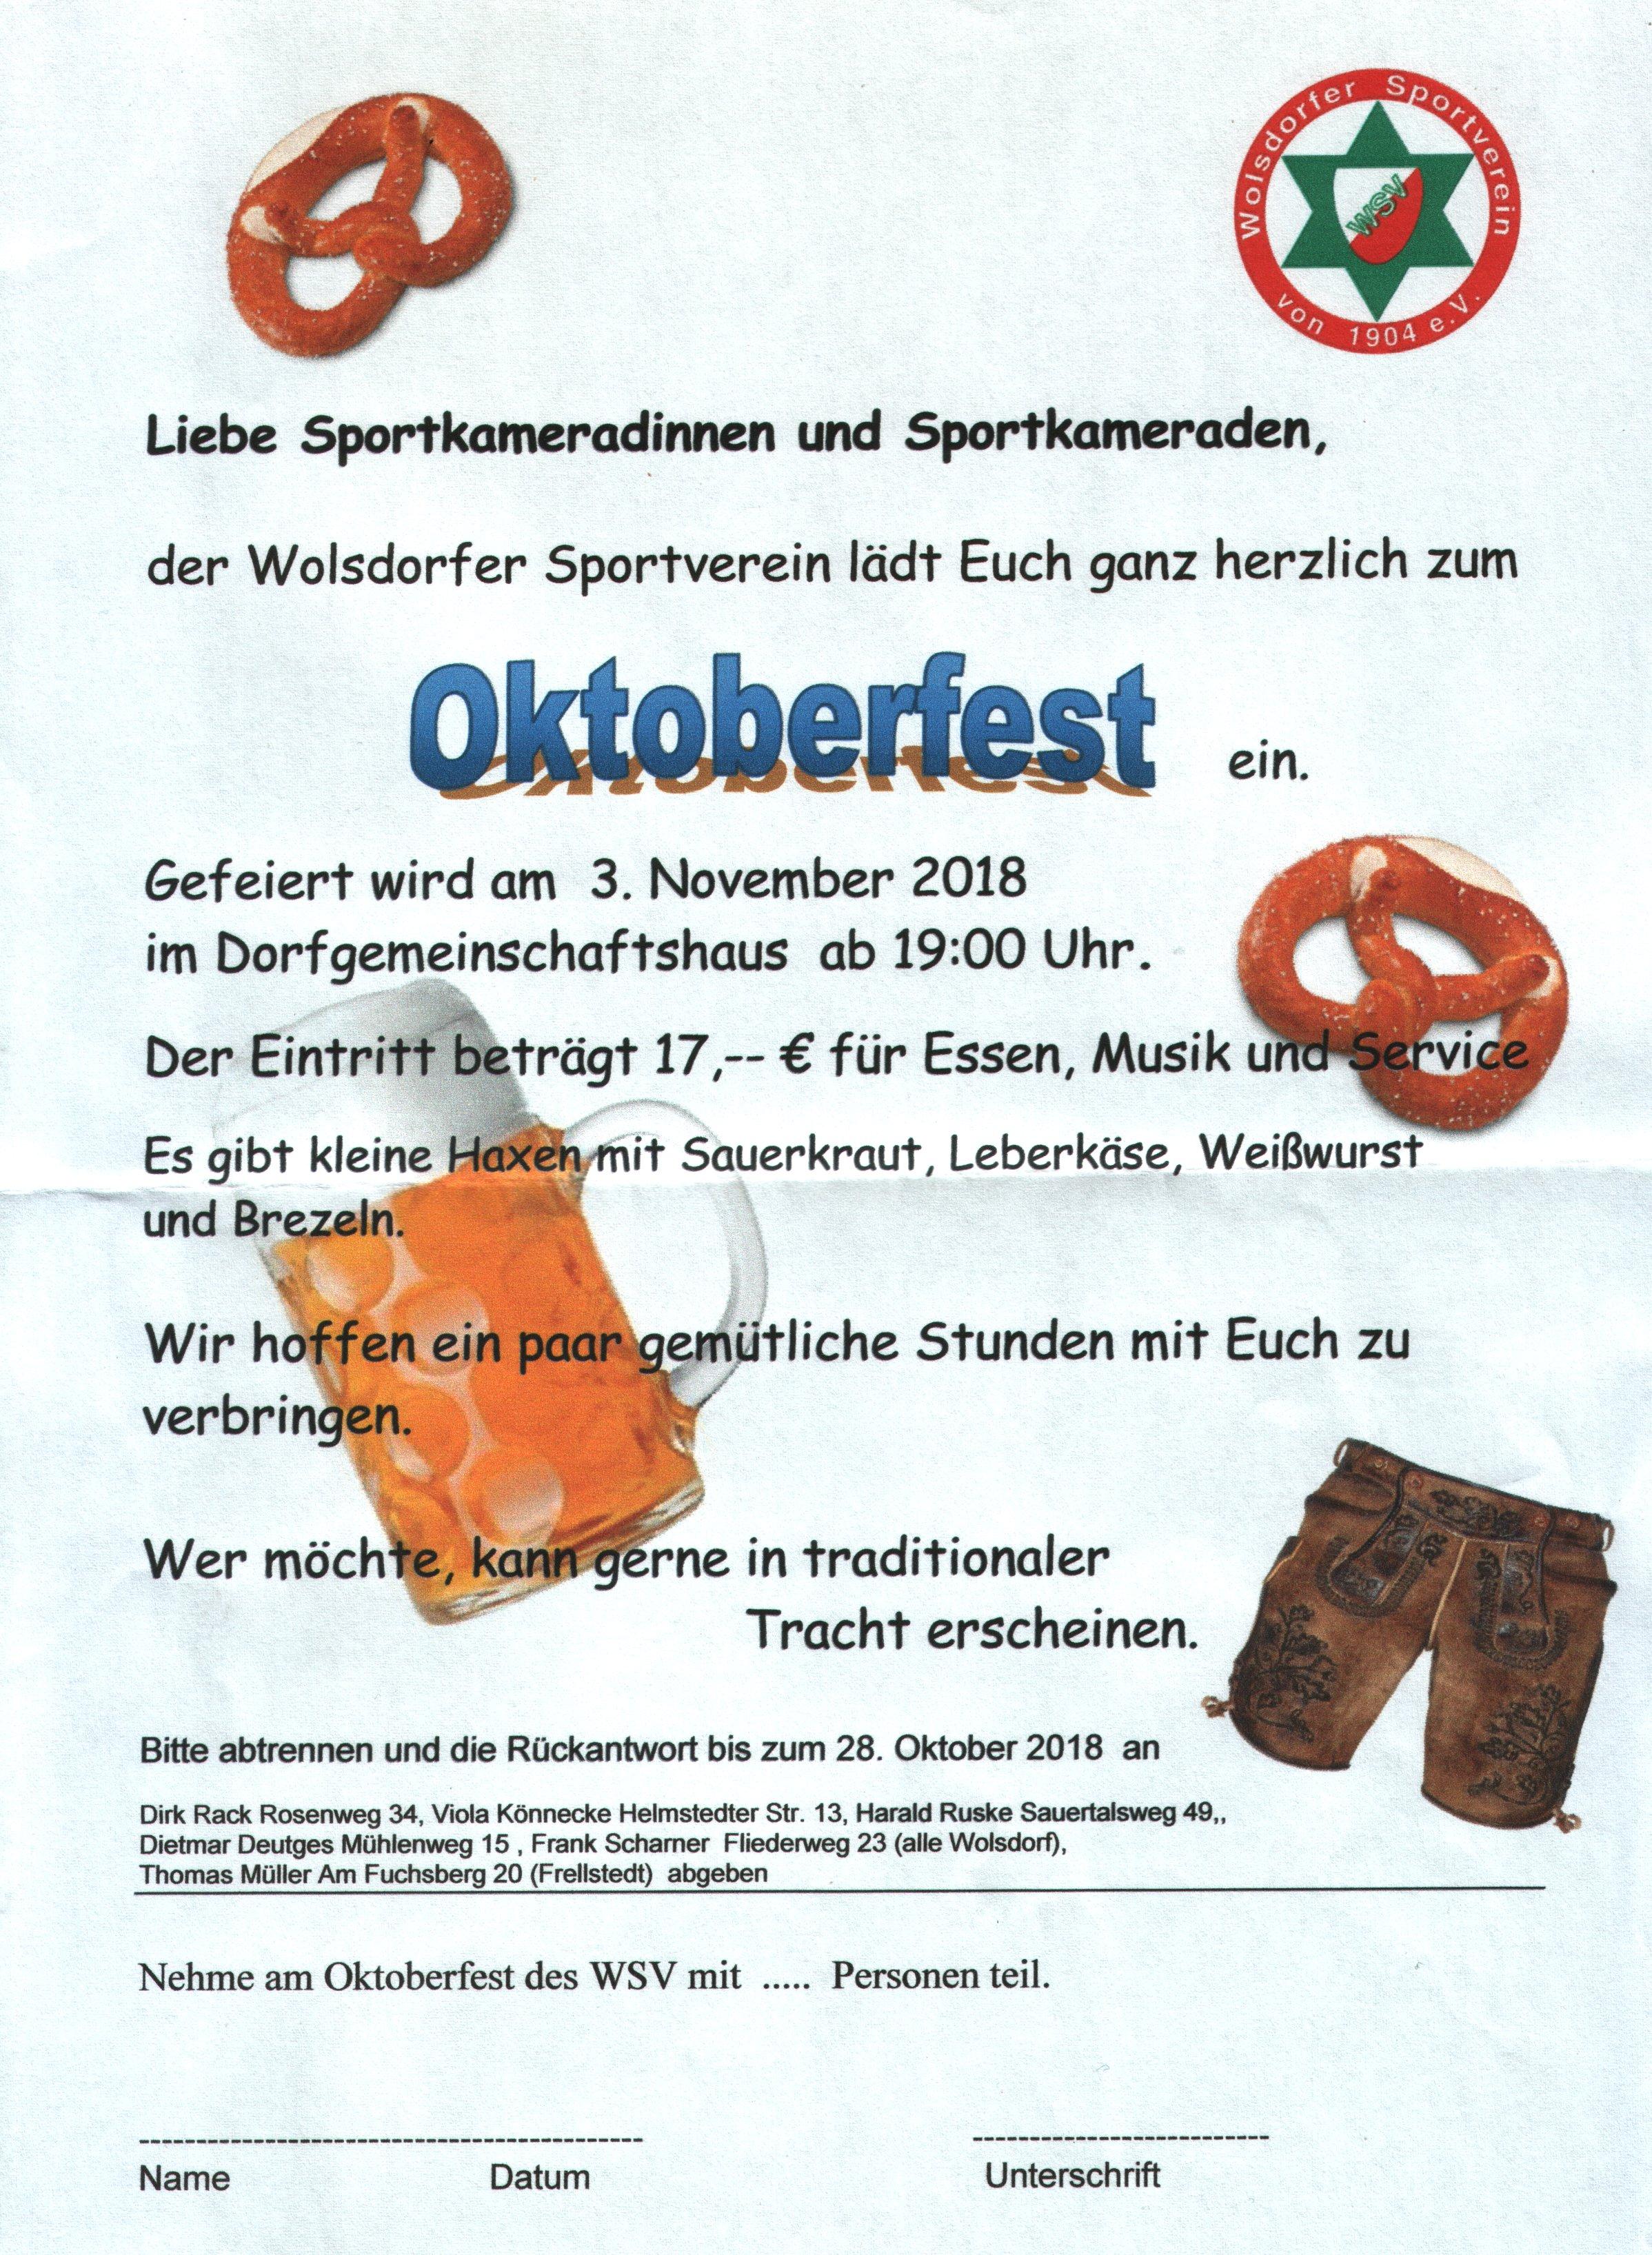 http://staff.footeo.com/uploads/wsv-wolsdorf/Medias/Einladung zum Oktoberfest 2018.jpg